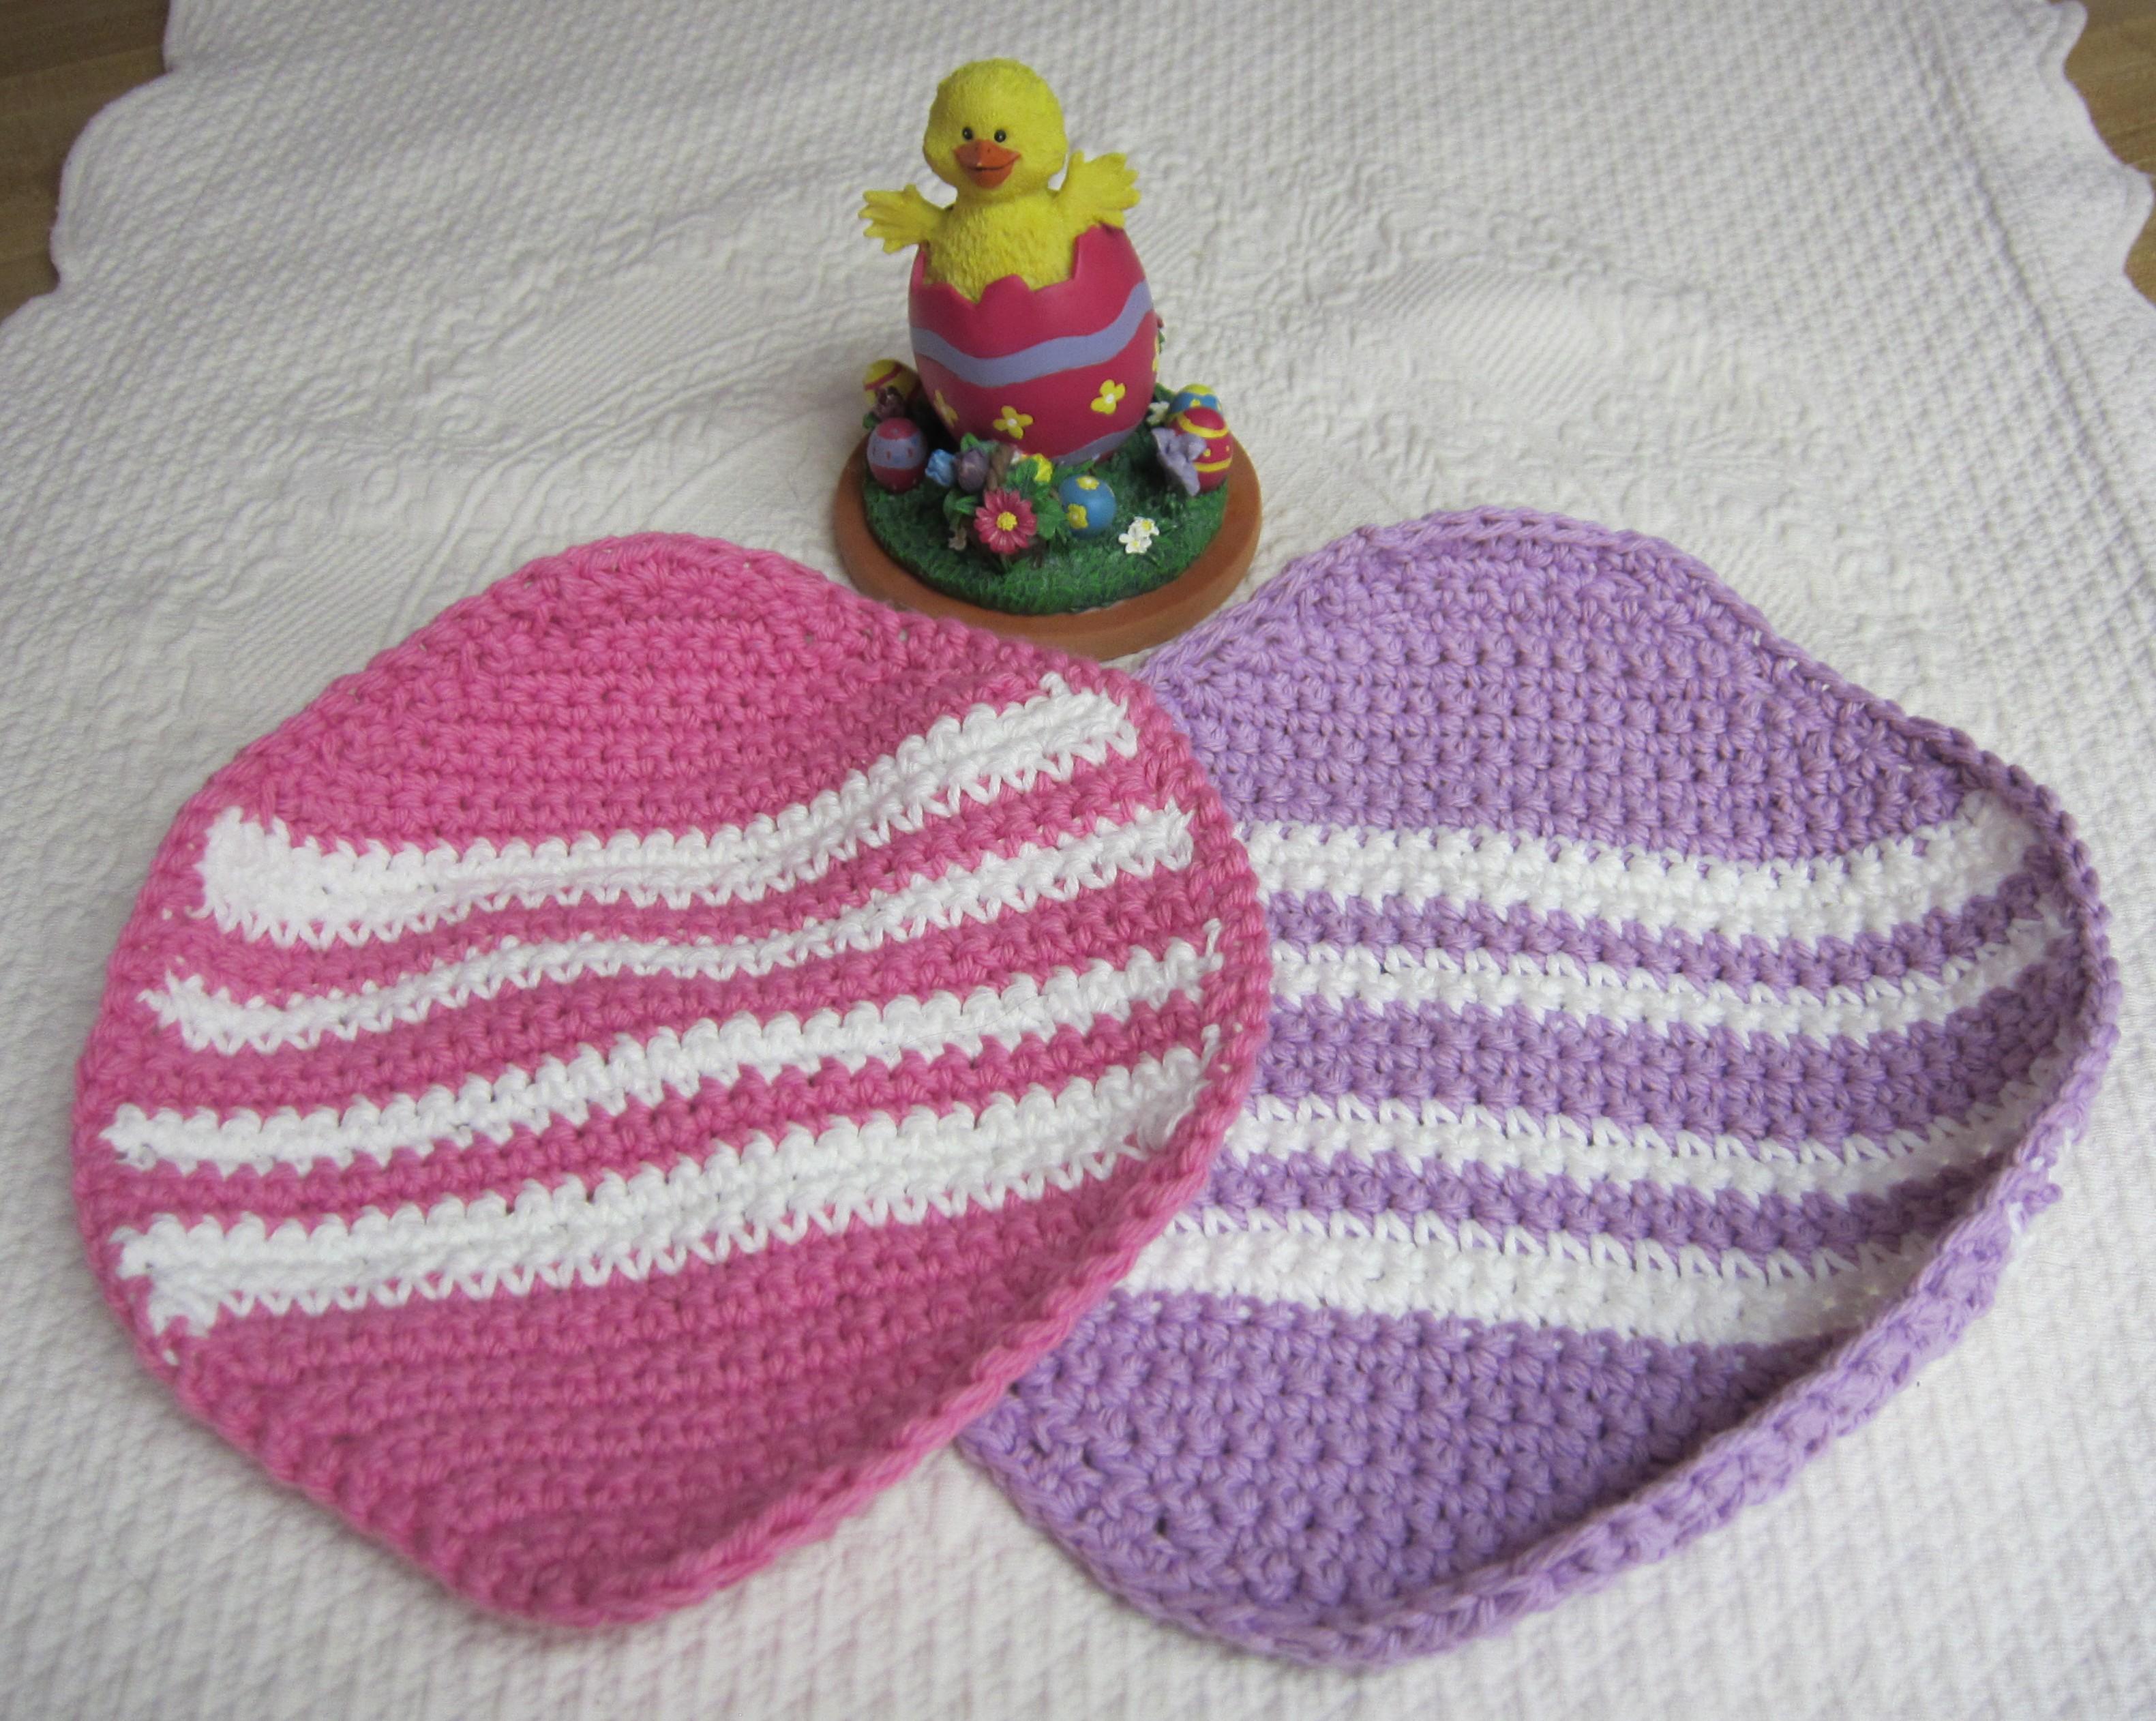 Free crochet easter dishcloth patterns manet for crochet dishclothwashclothcotton dishclothseaster egg bankloansurffo Gallery